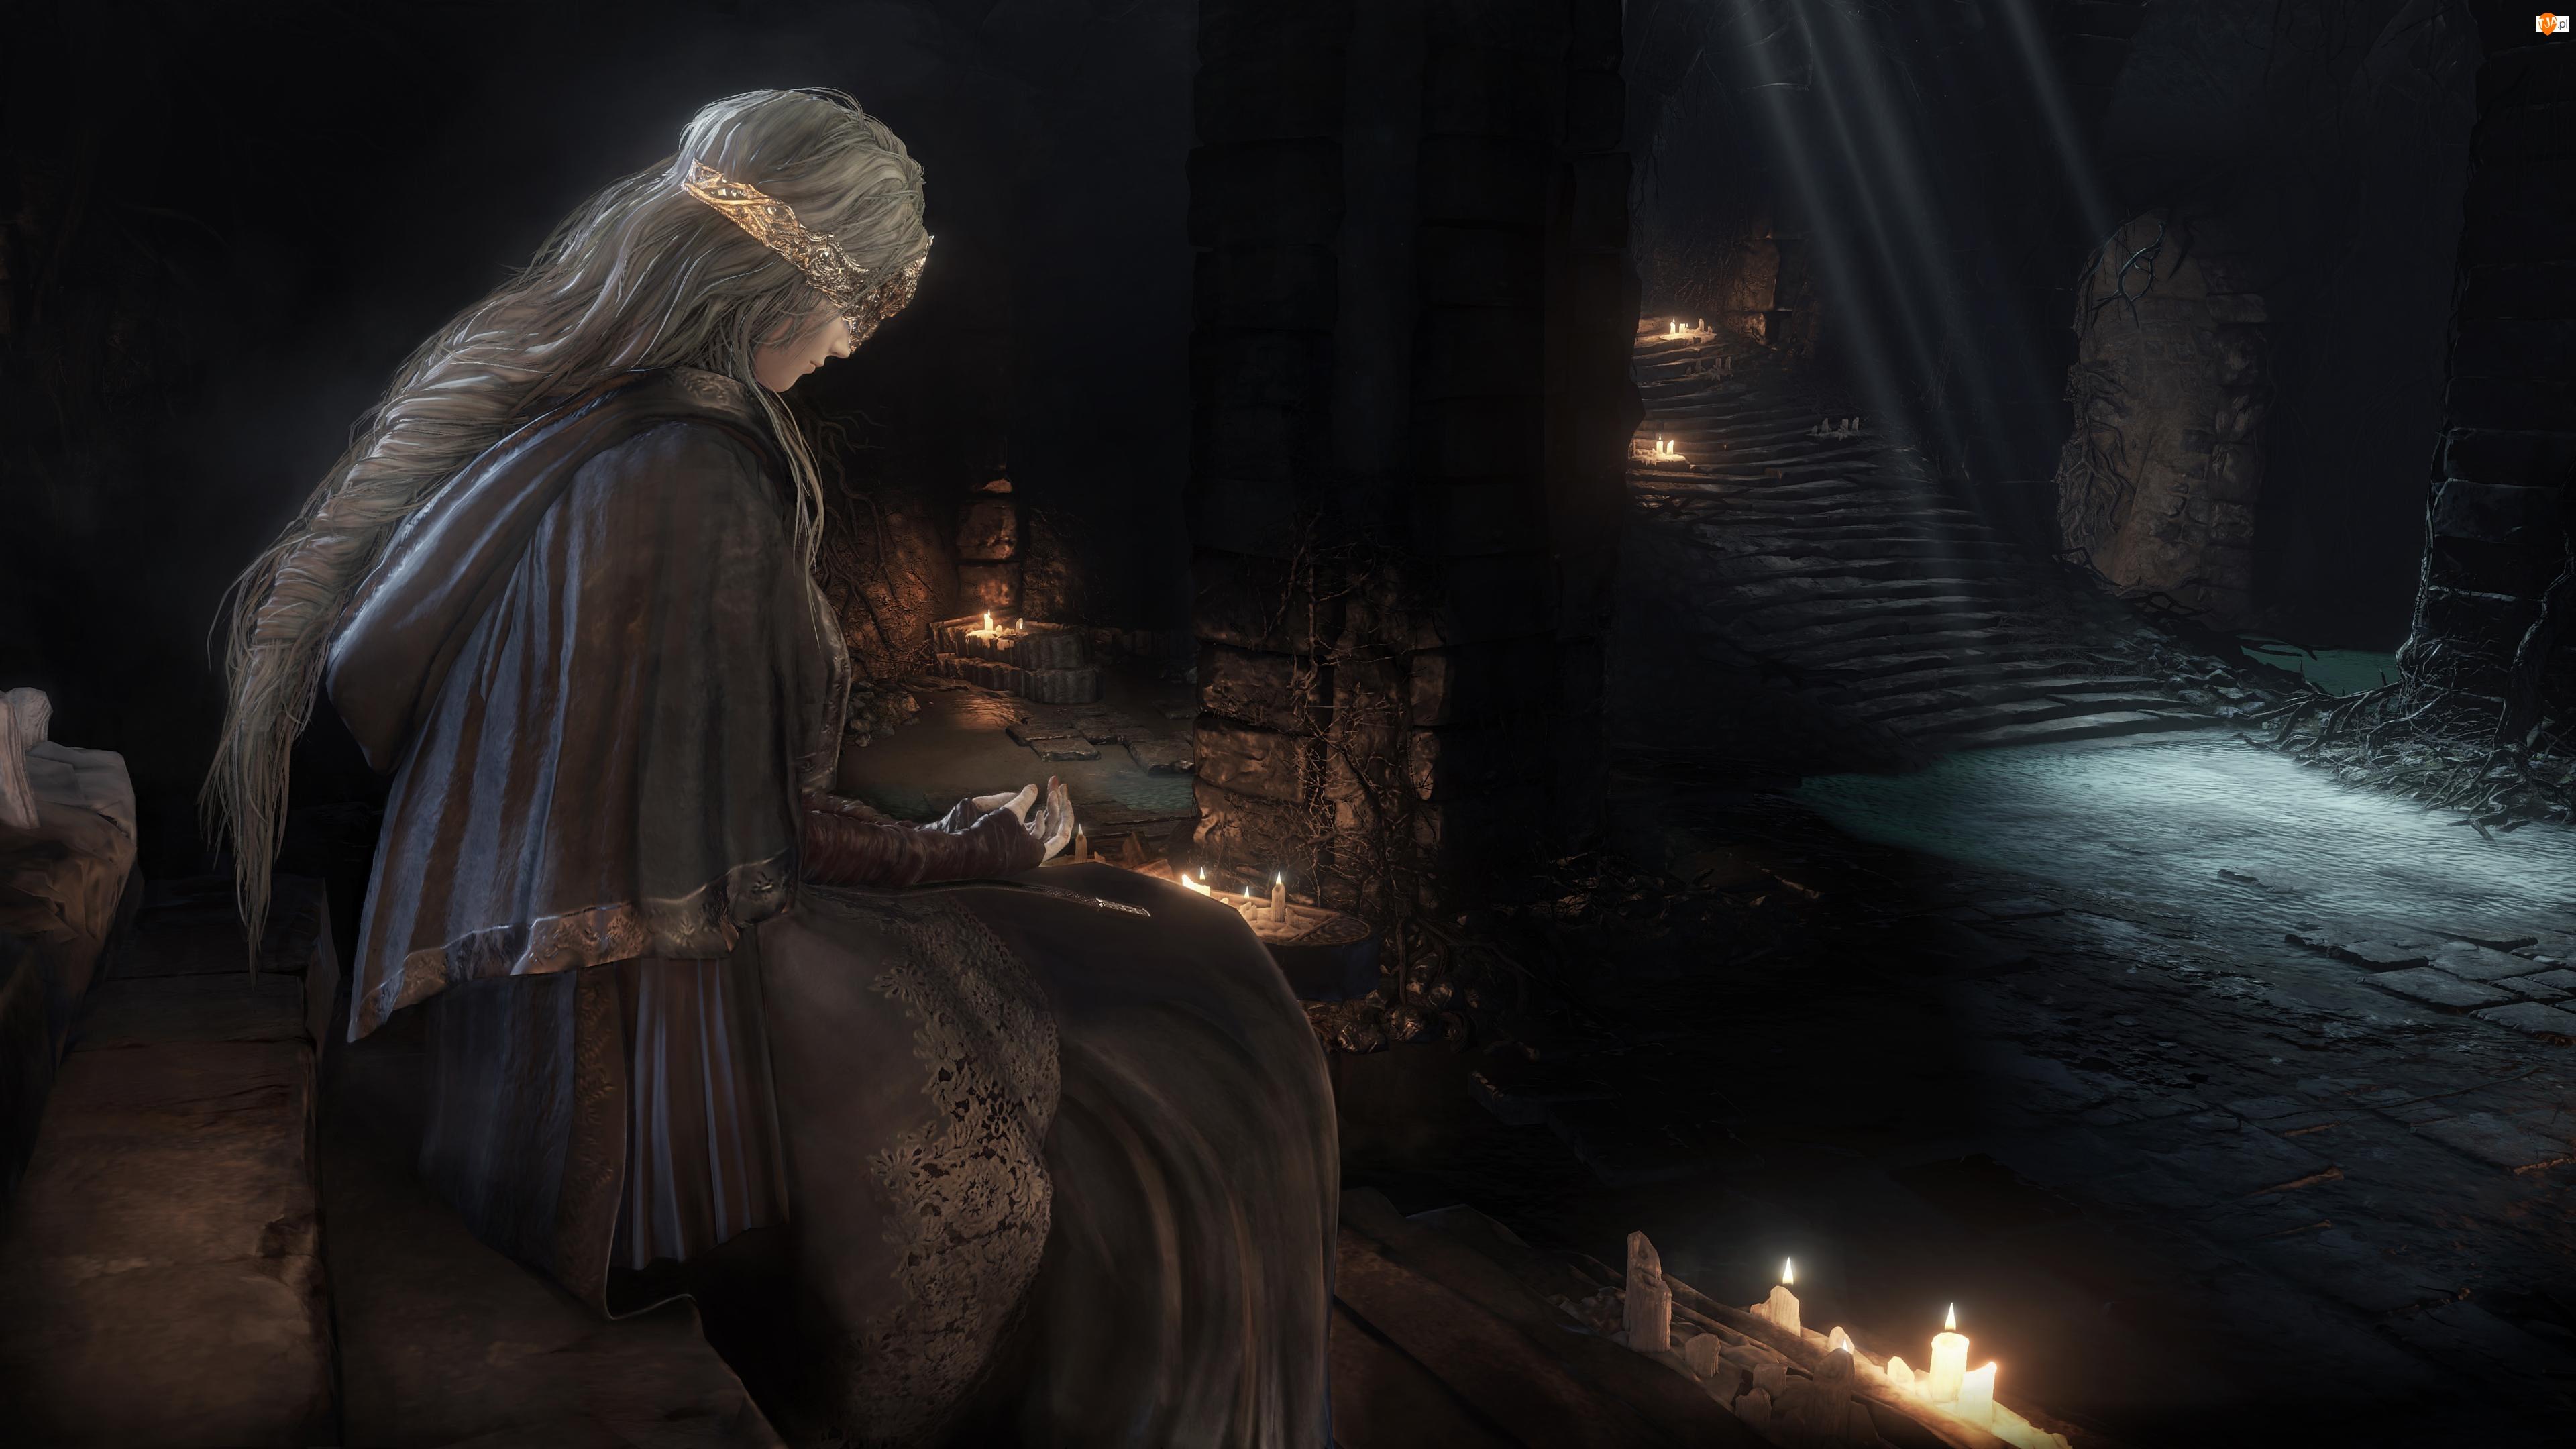 Strażniczka ognia, Gra, Dark Souls 3